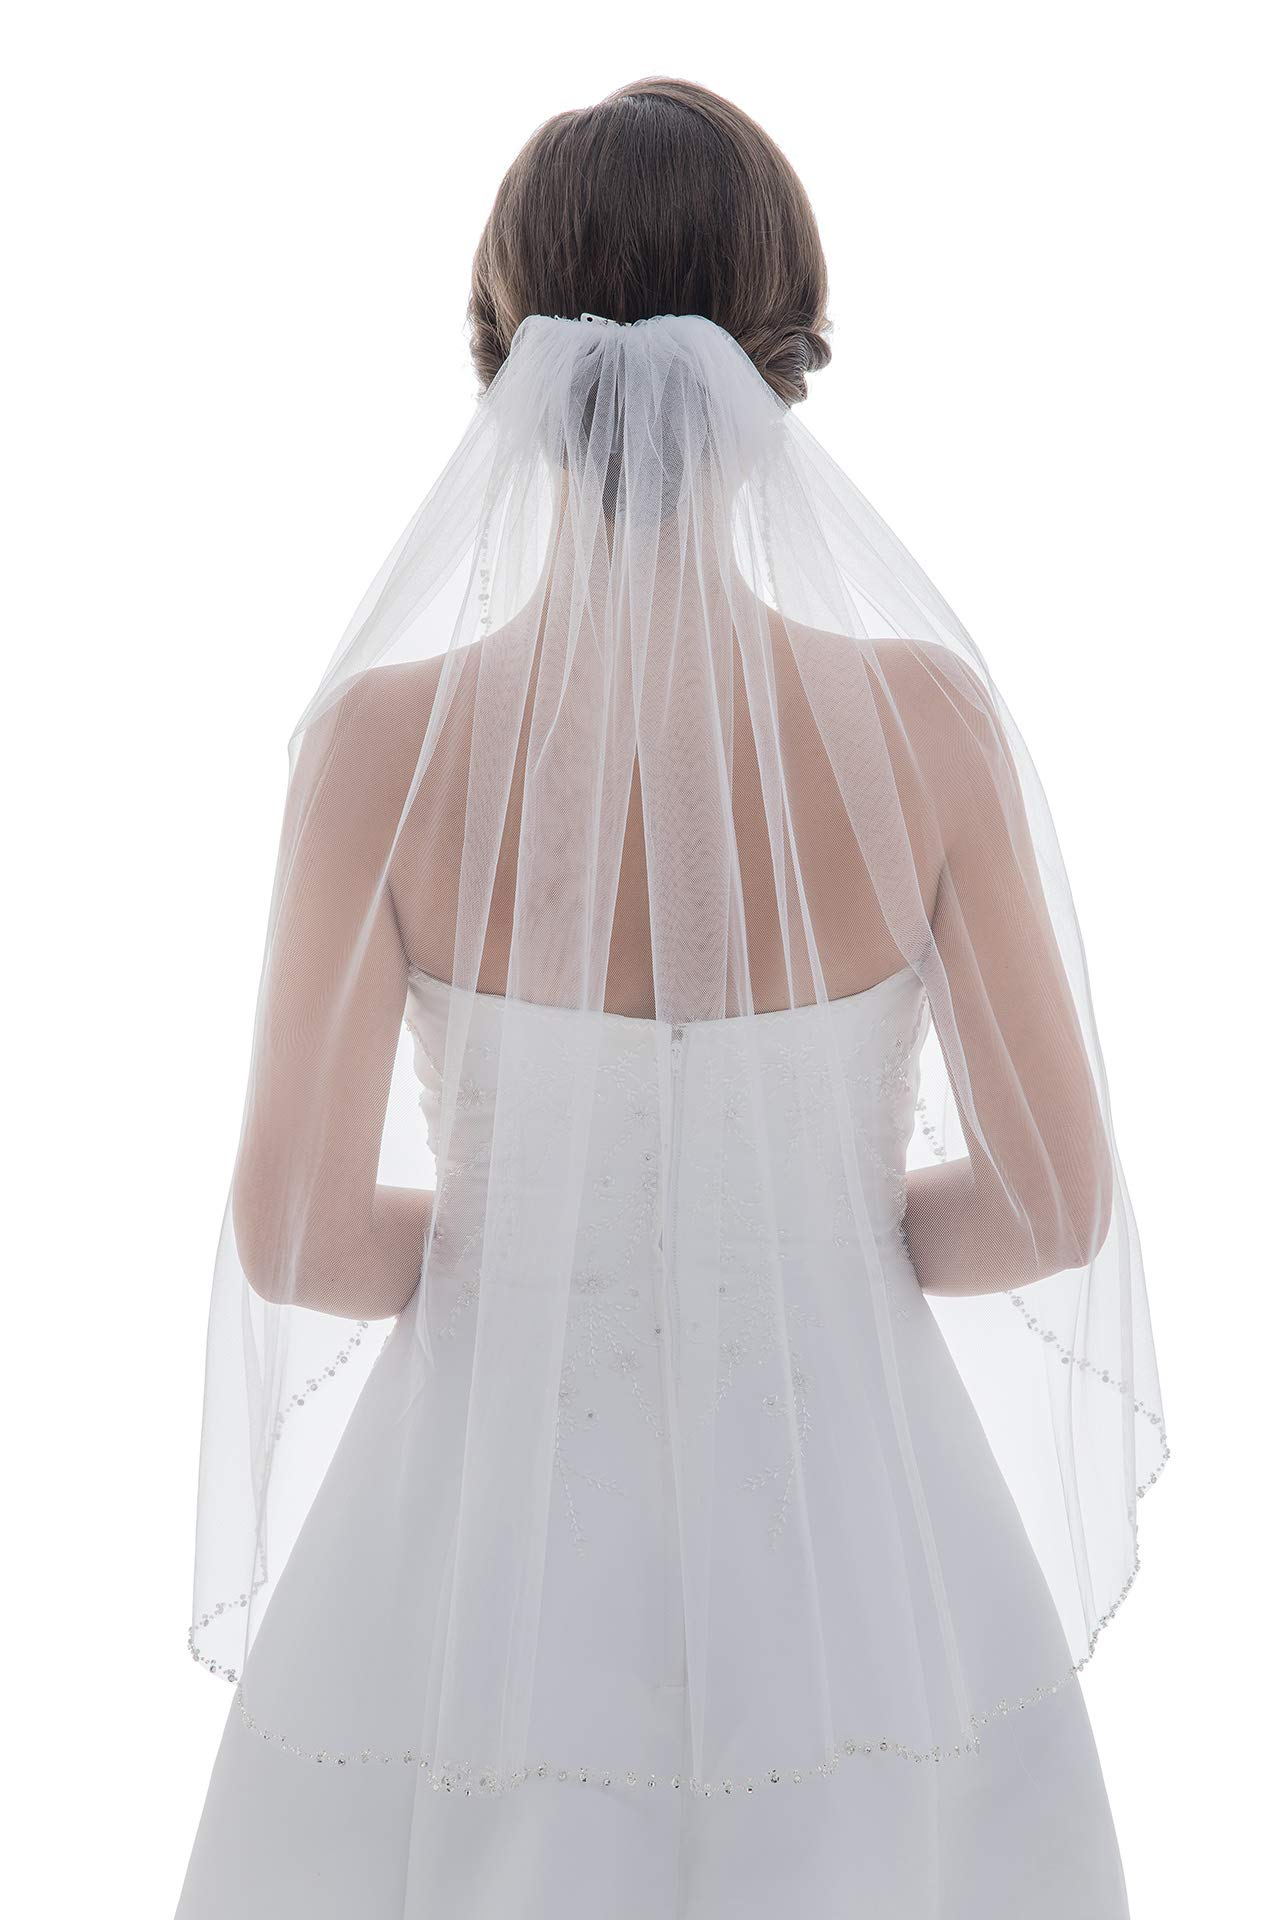 1T Rhinestone Pearl Sequin Beaded Wedding Veil (Fingertip Length 36'', Ivory)